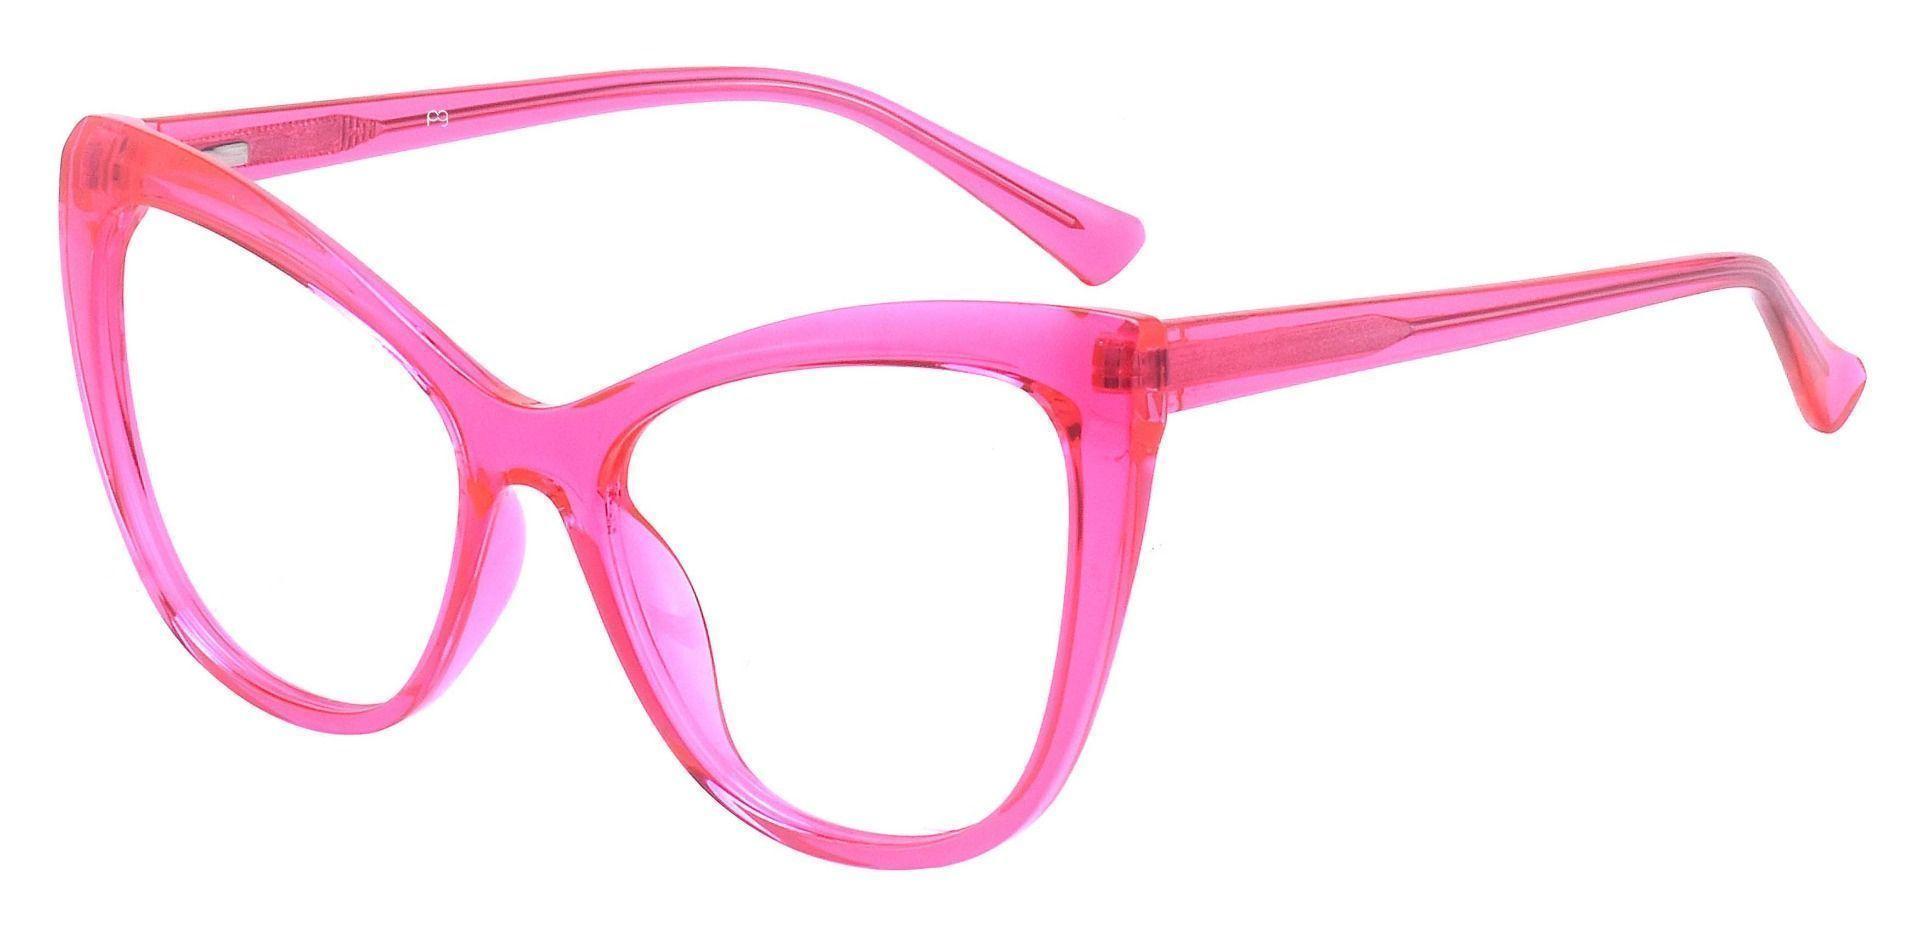 Norma Cat Eye Prescription Glasses - Pink